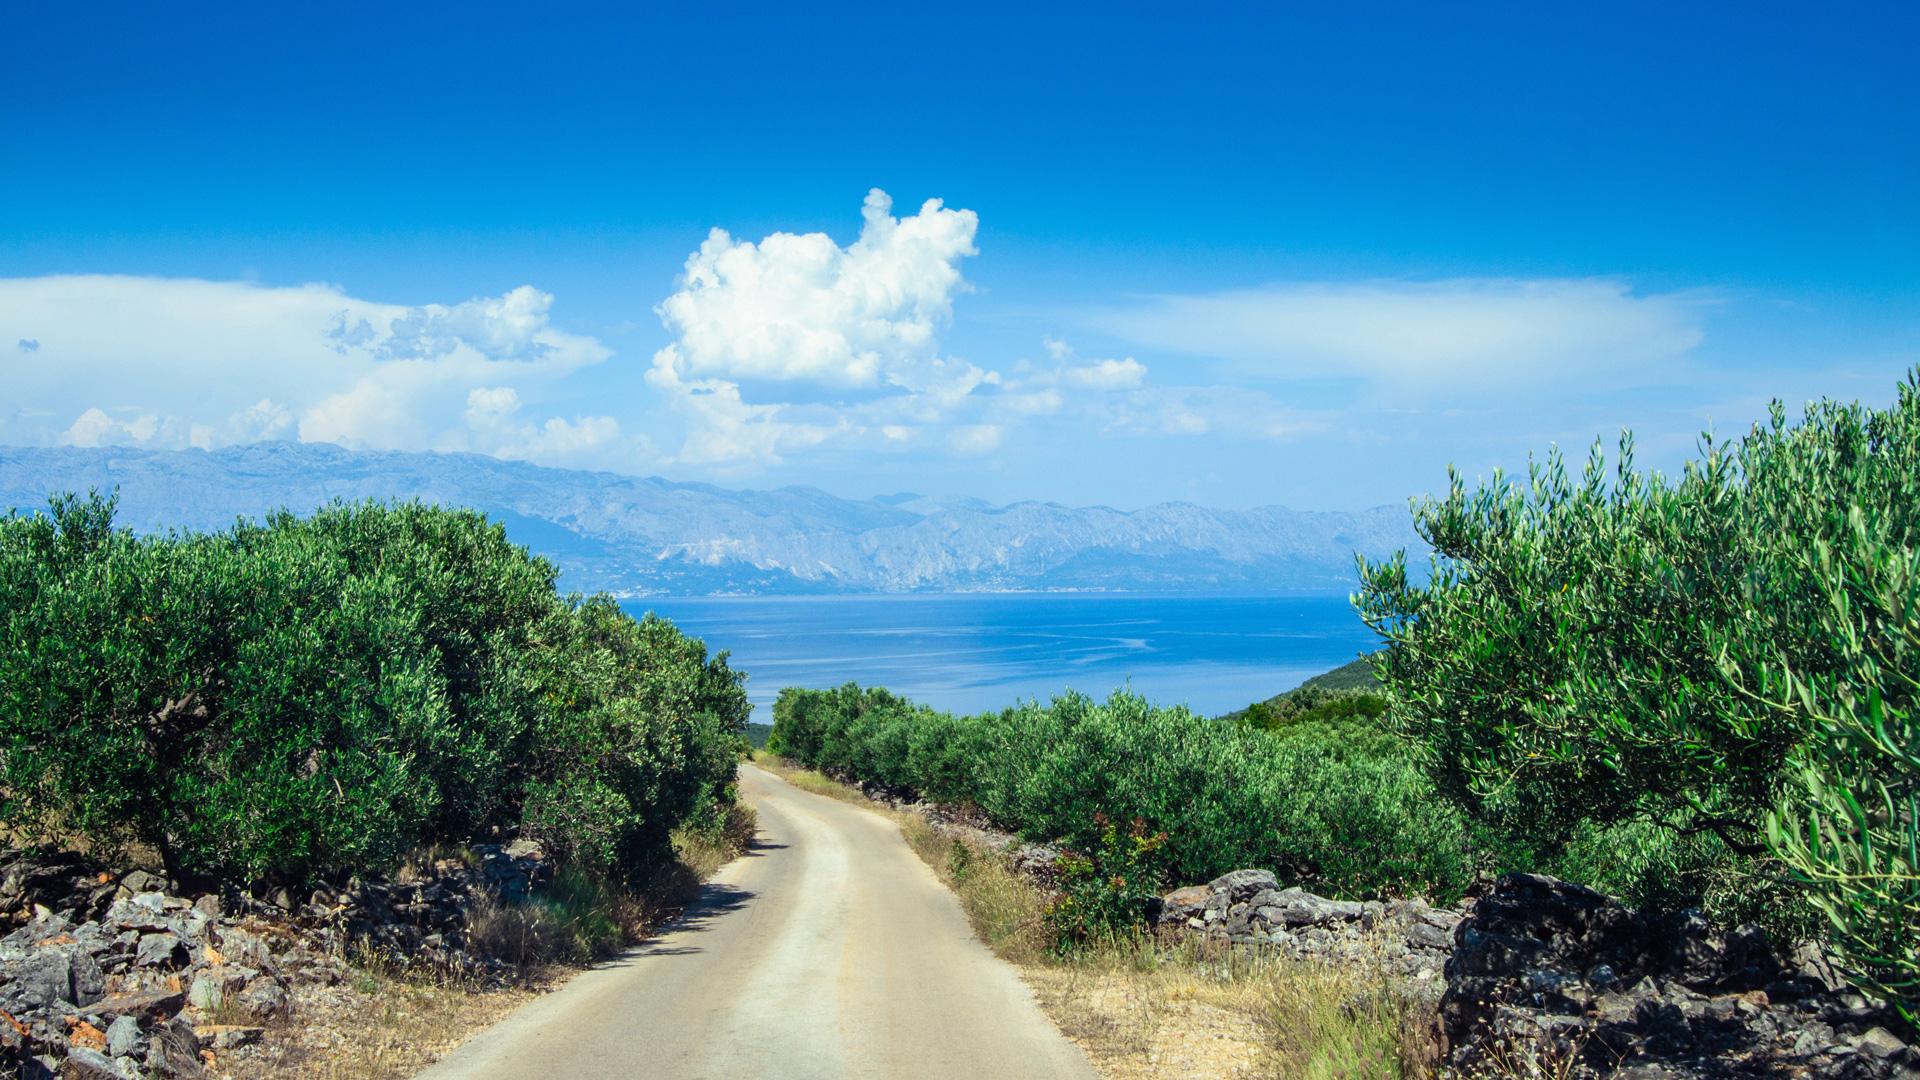 L'isola di Hvar in Croazia